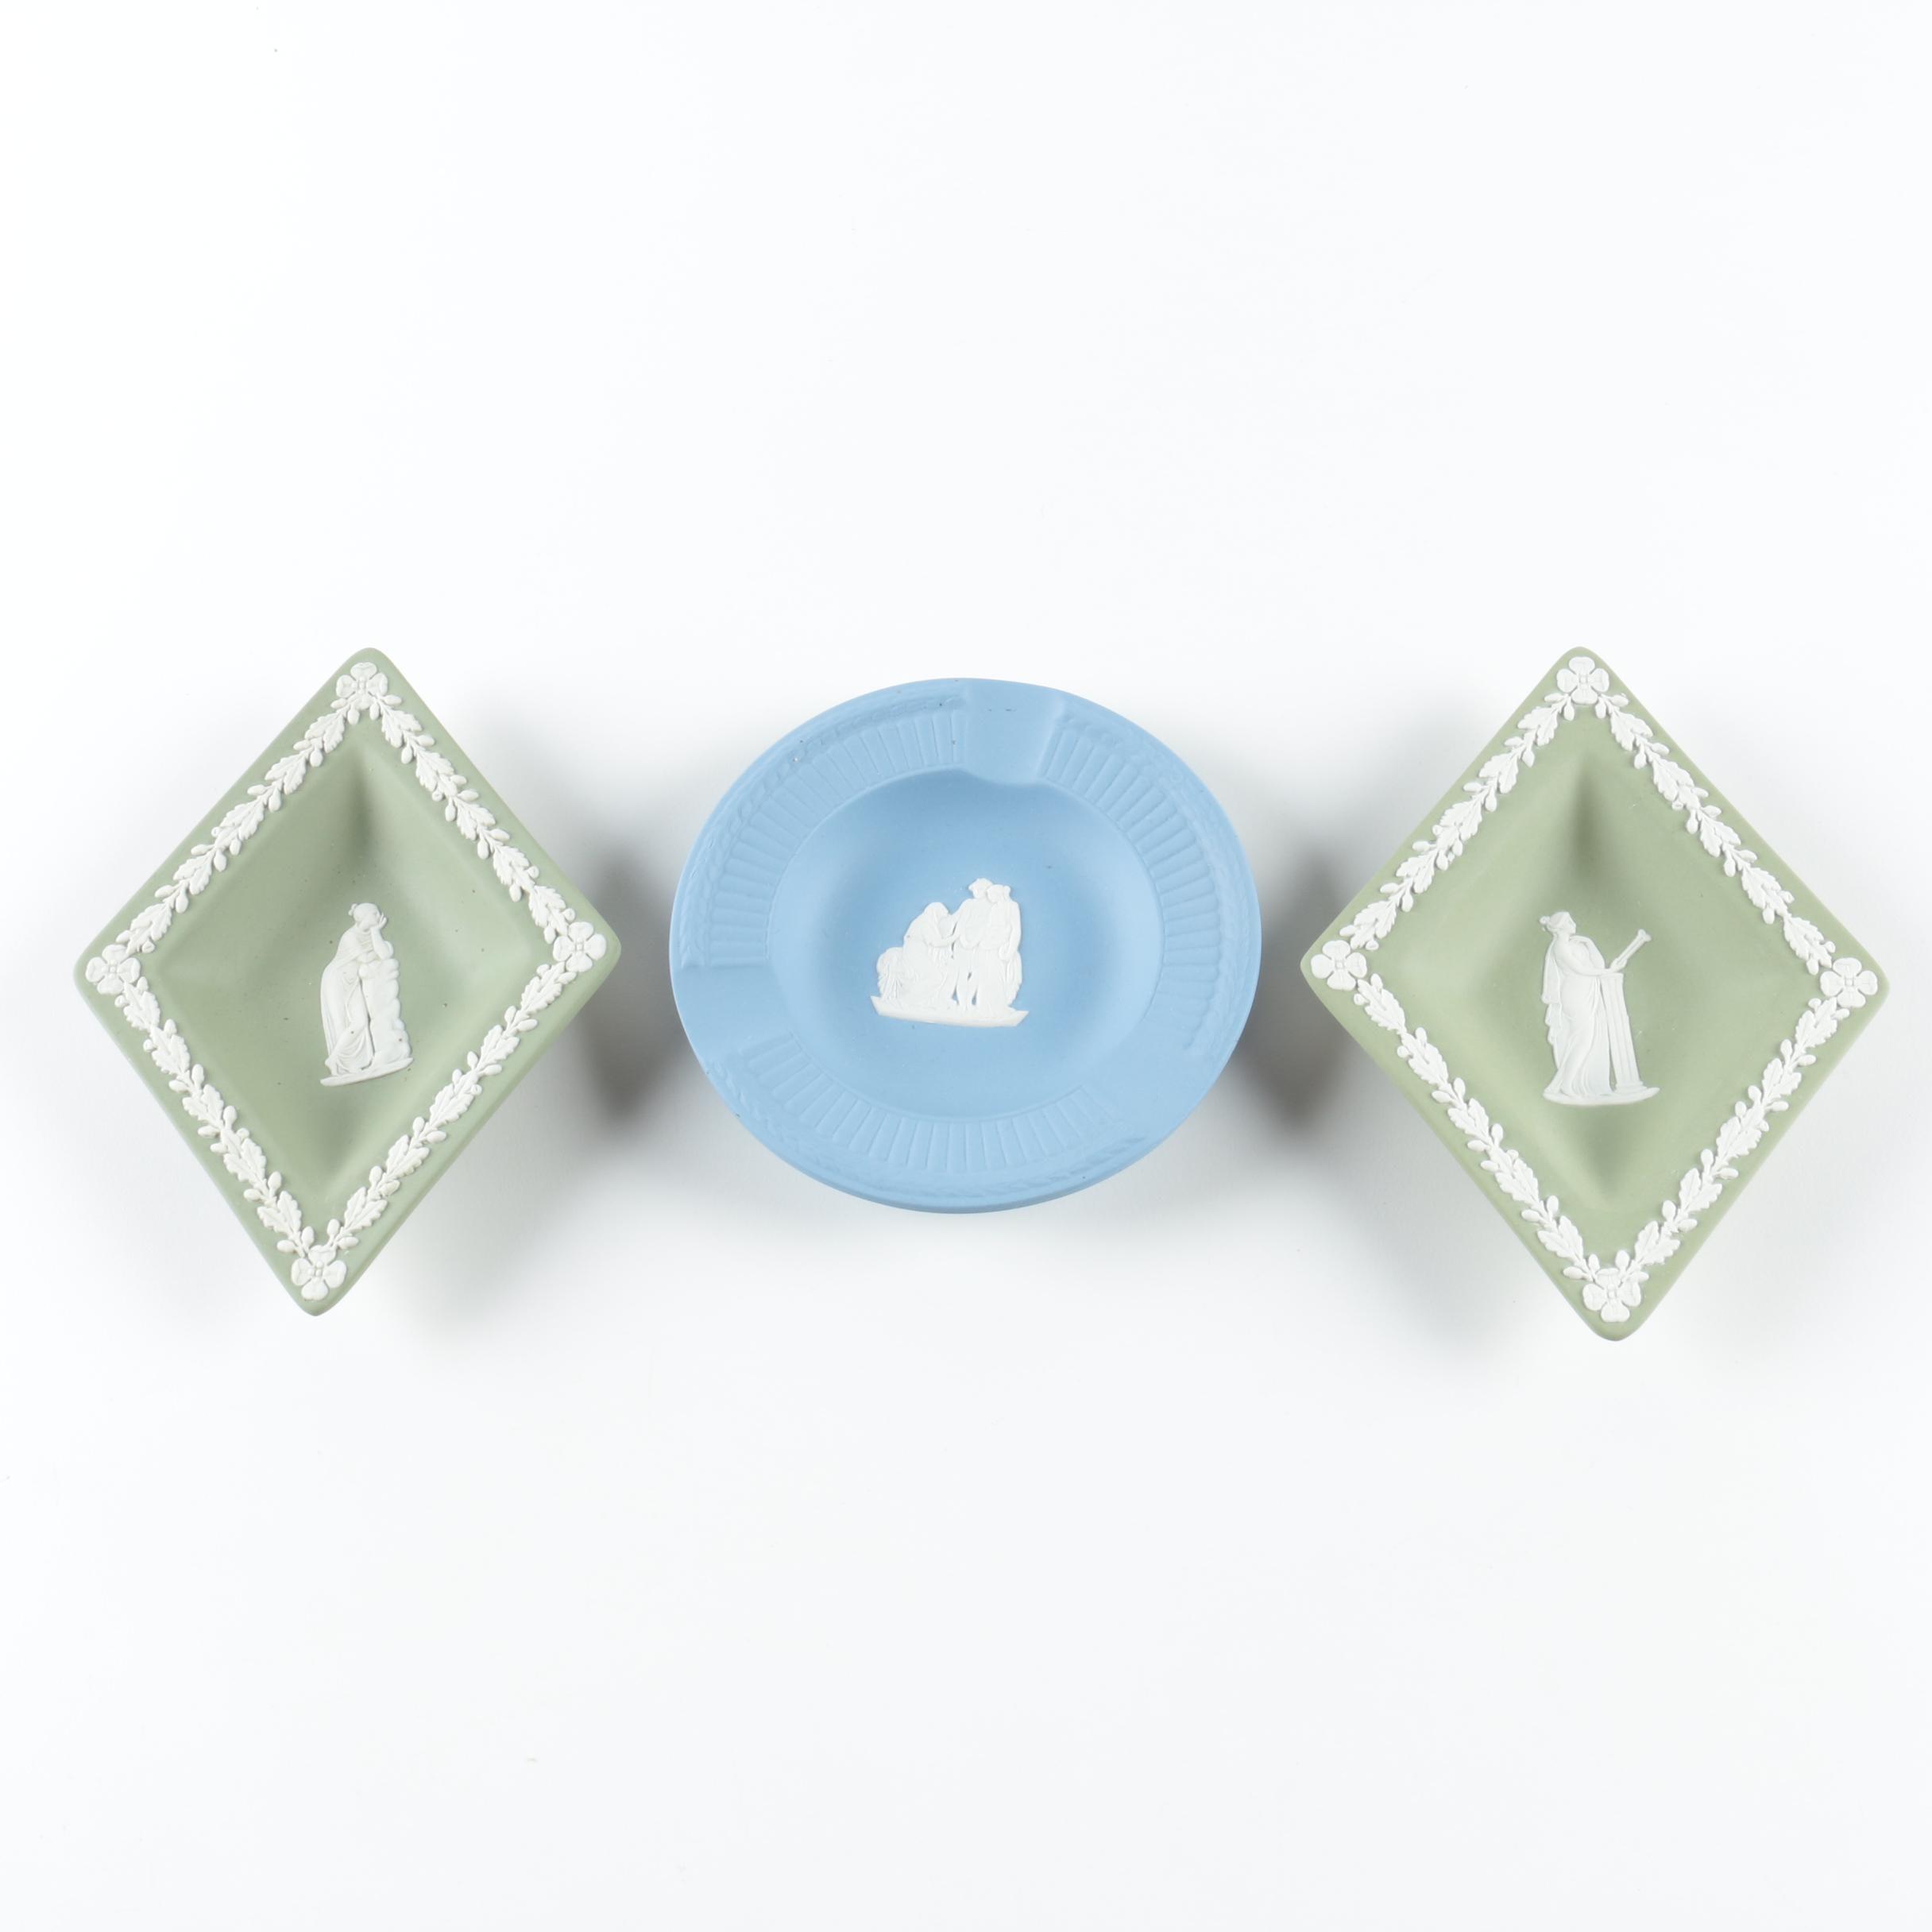 Wedgwood Jasperware Ash Receiver and Trinket Dishes